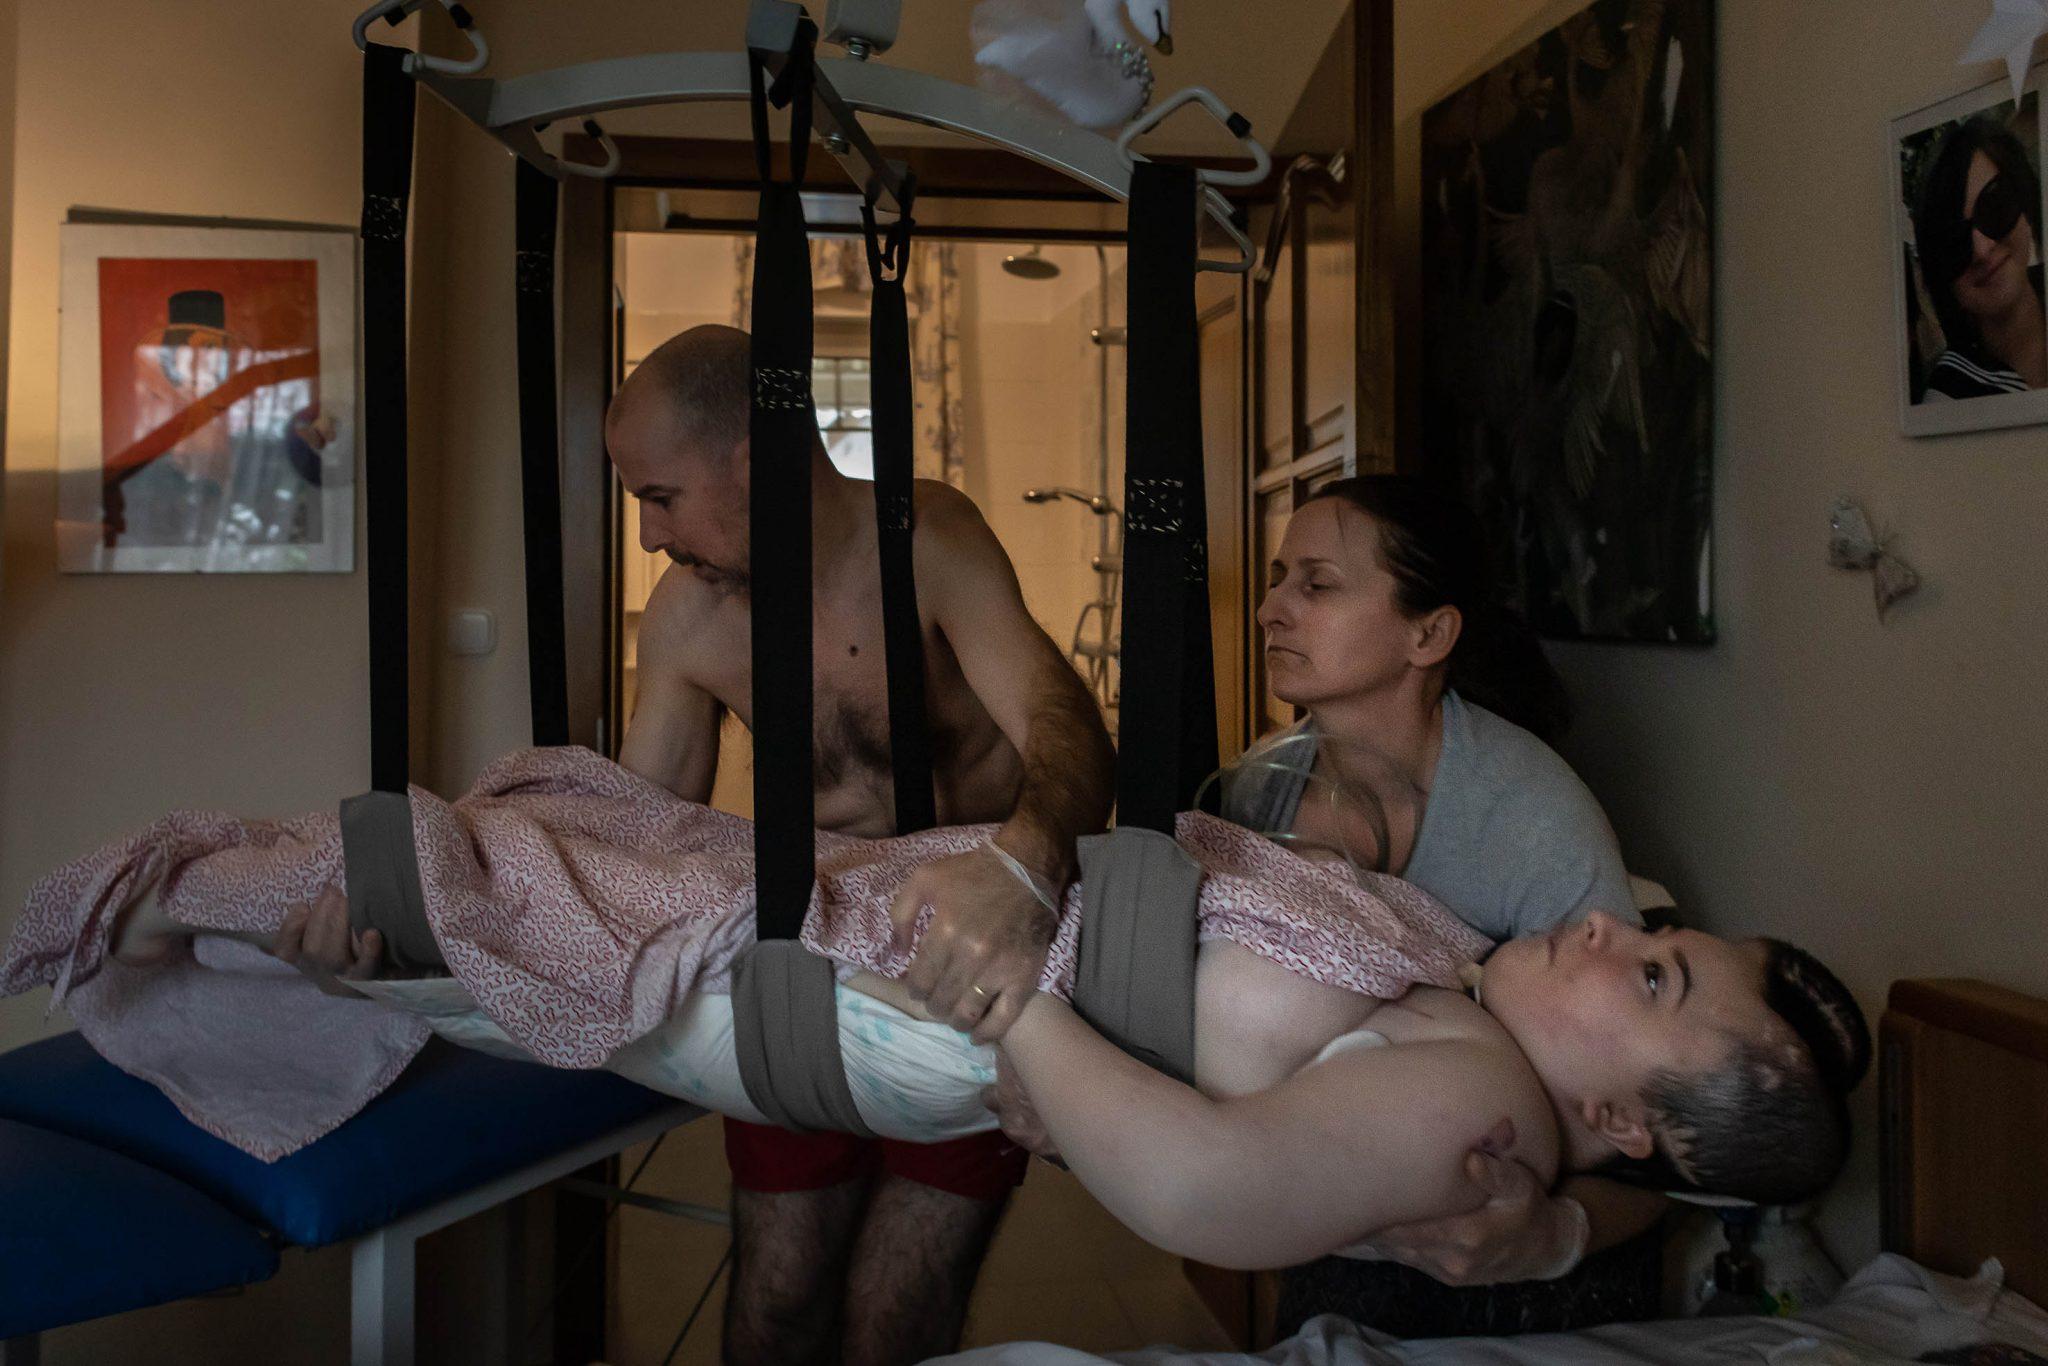 Family Home Care and Nagybánya Segregation Photos Win Hungarian Press Photo Award's Grand Prizes This Year